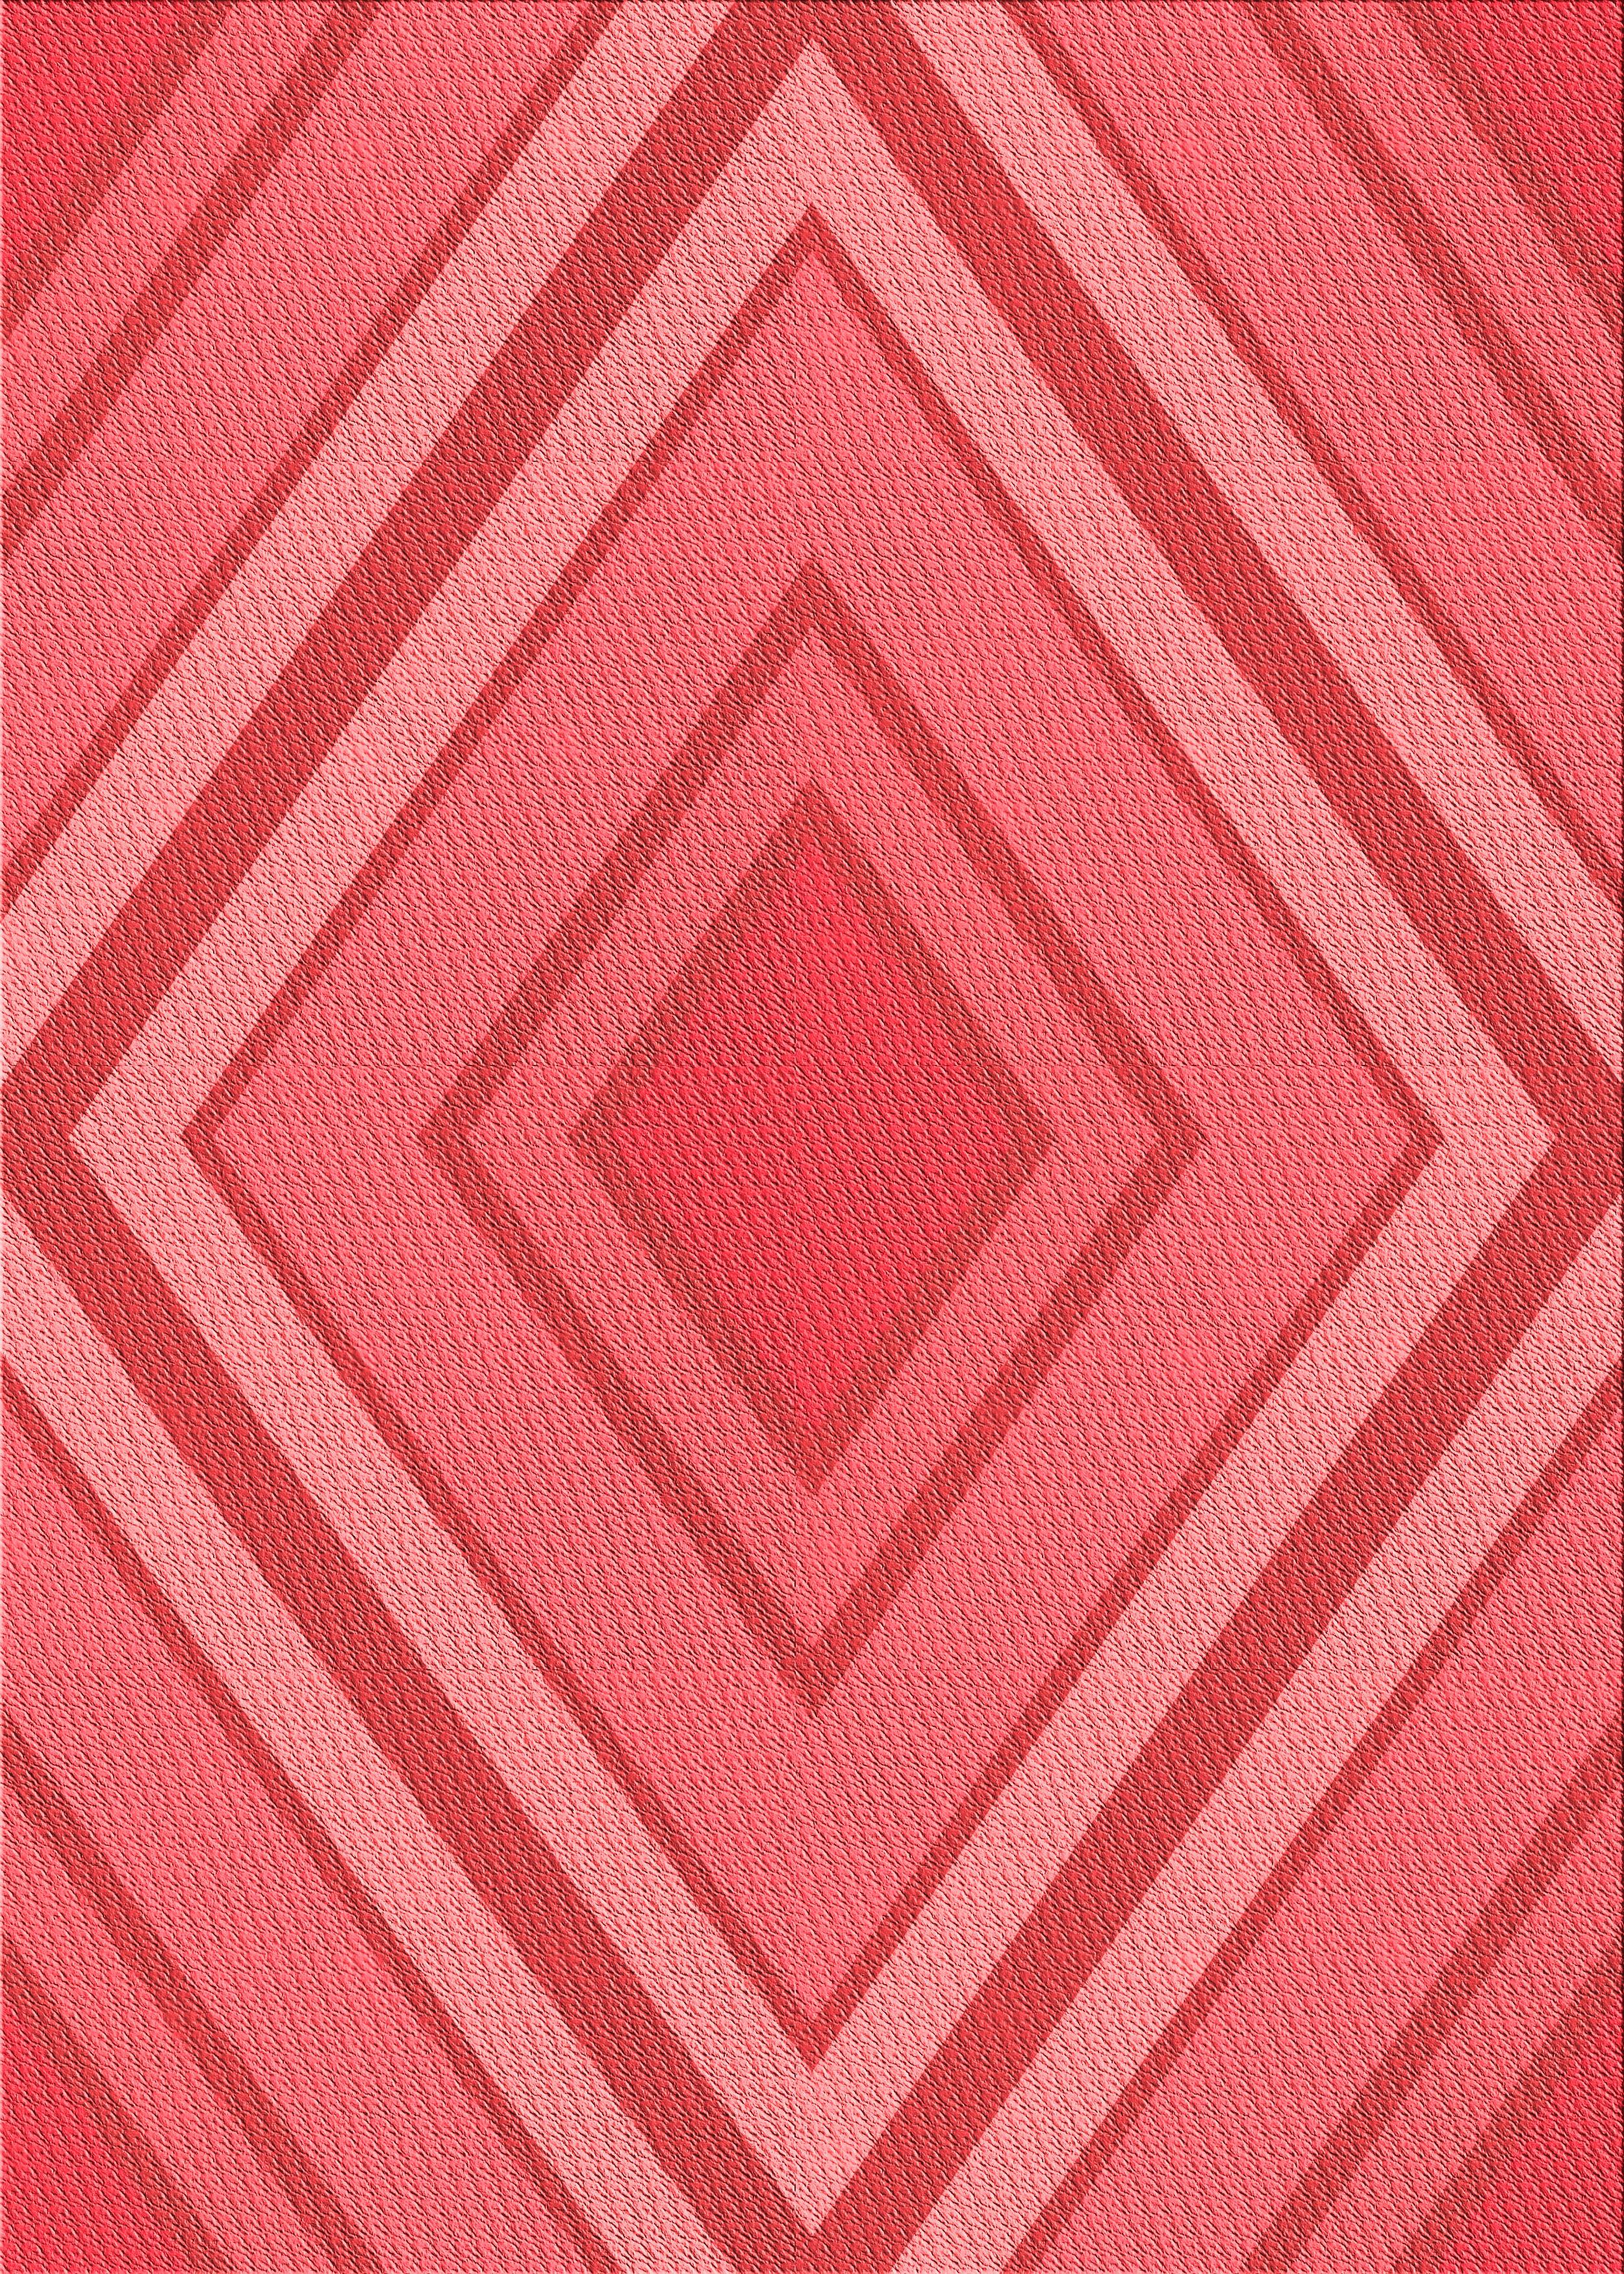 East Urban Home Comae Geometric Wool Red Area Rug Wayfair